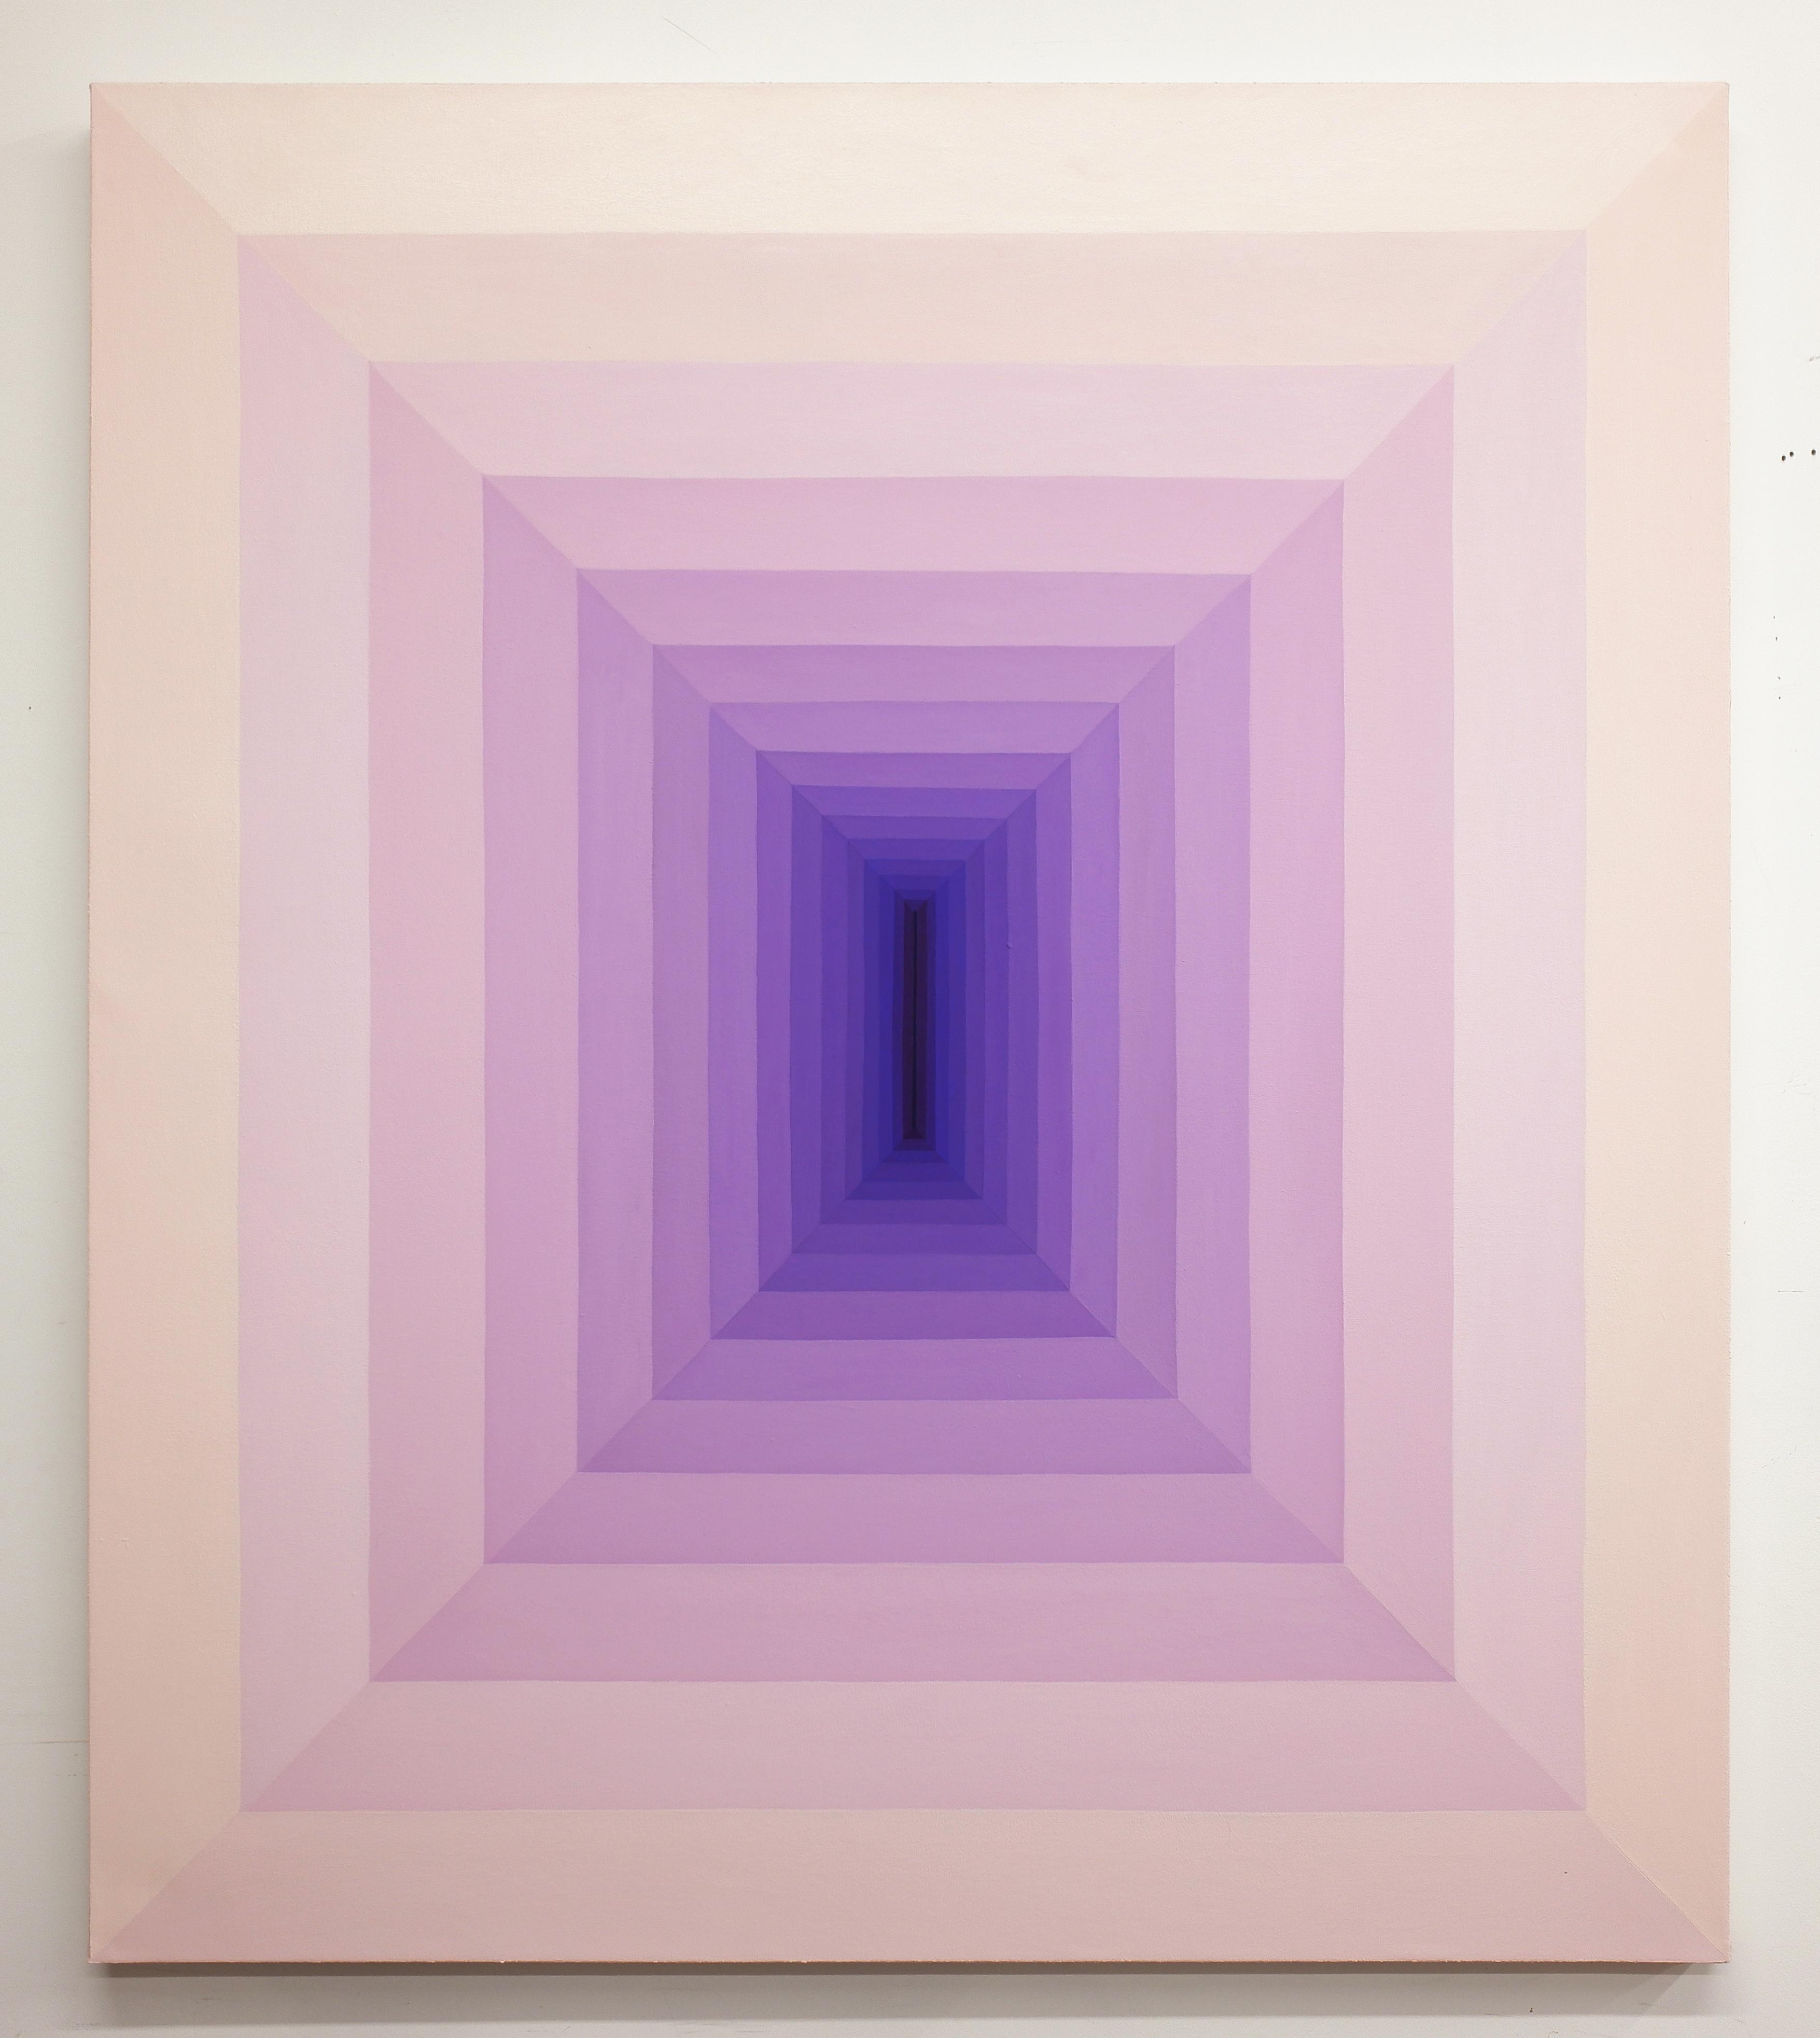 Corydon Cowansage, Hole 62, 2019, acrylic and vinyl paint on canvas, 50 x 46 inches